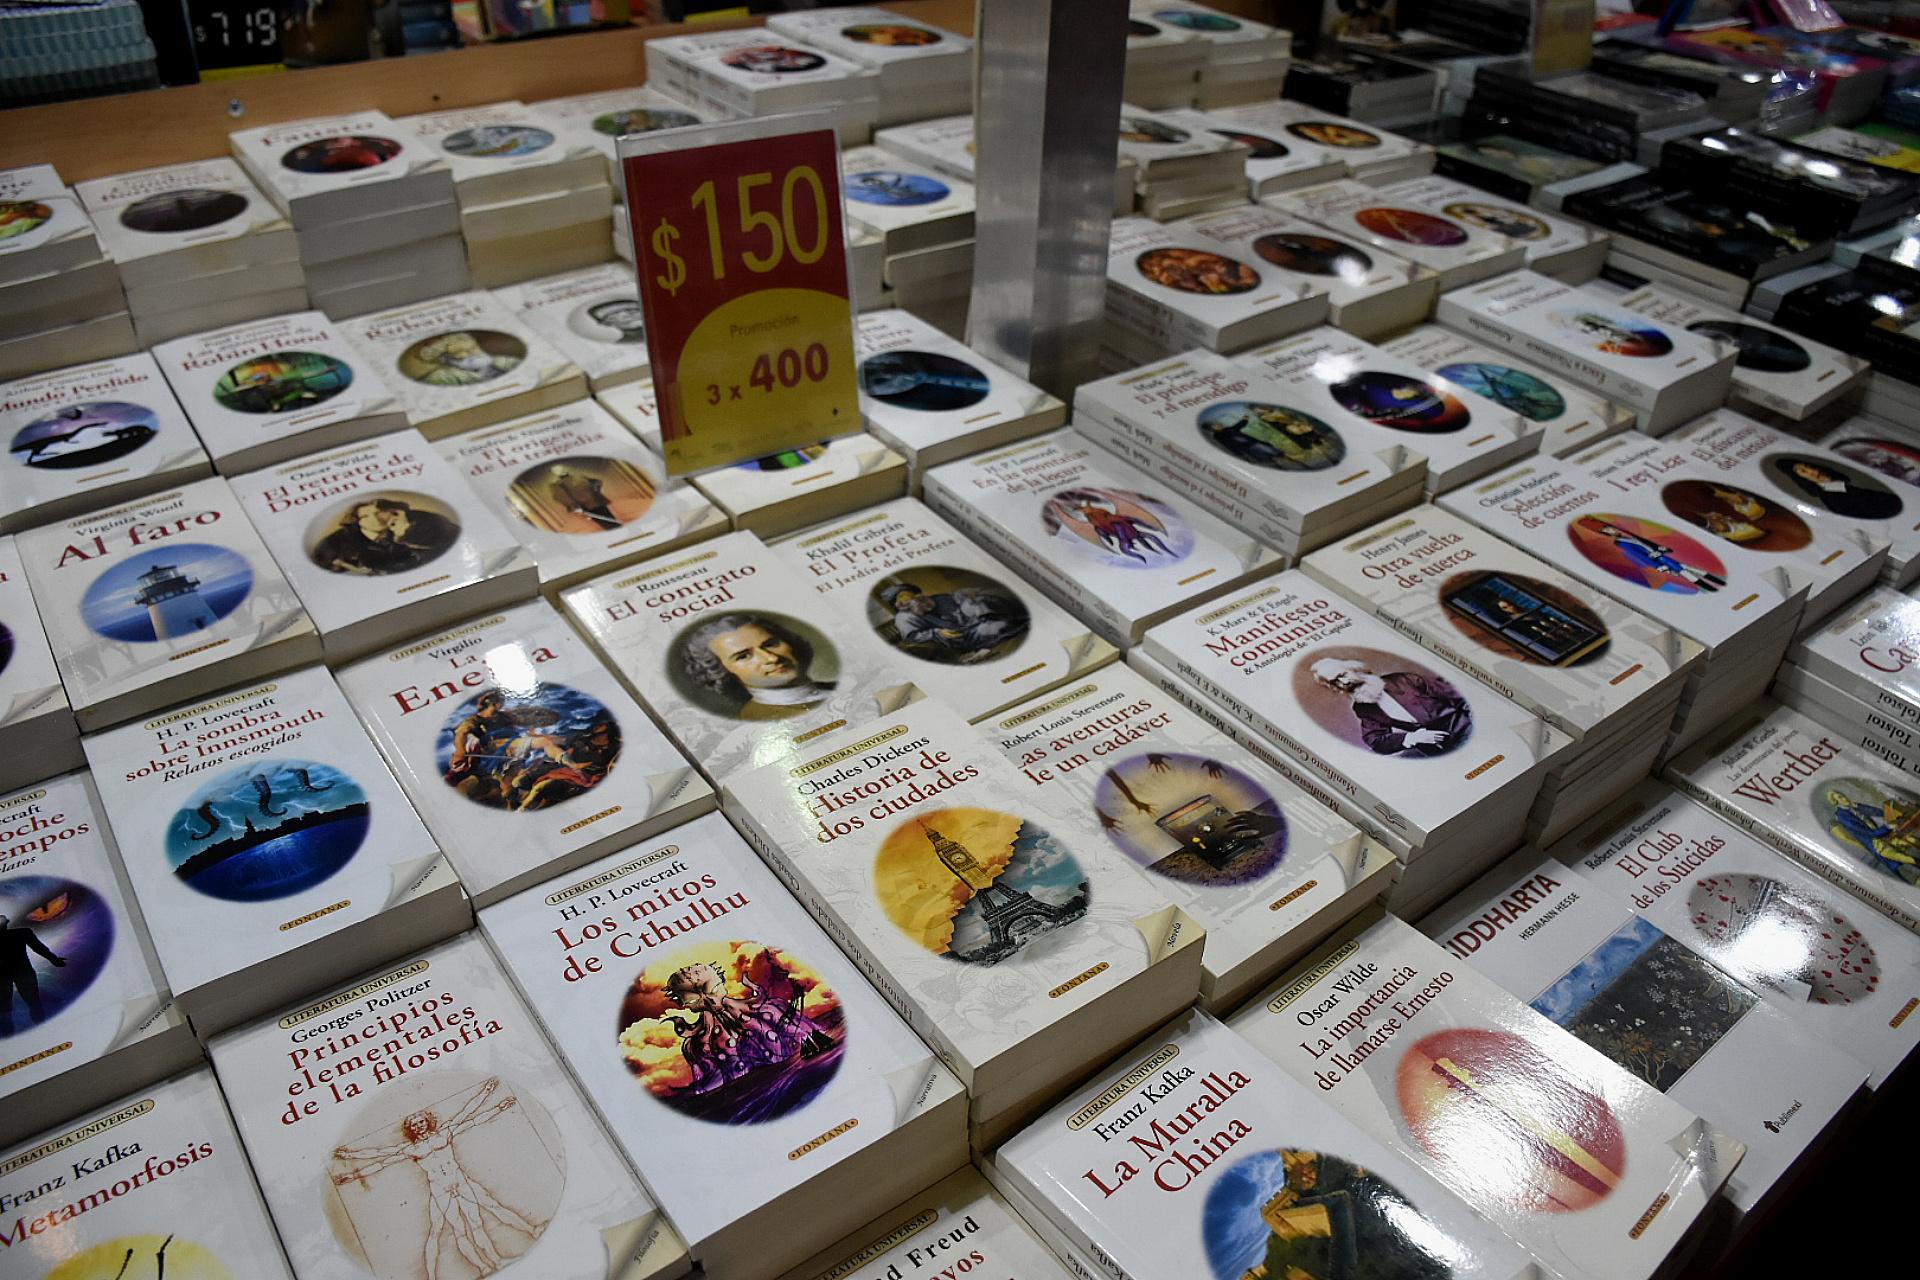 Marx, Lovecraft y Kafka a $150 o 3 x $400 (Nicolás Stulberg)